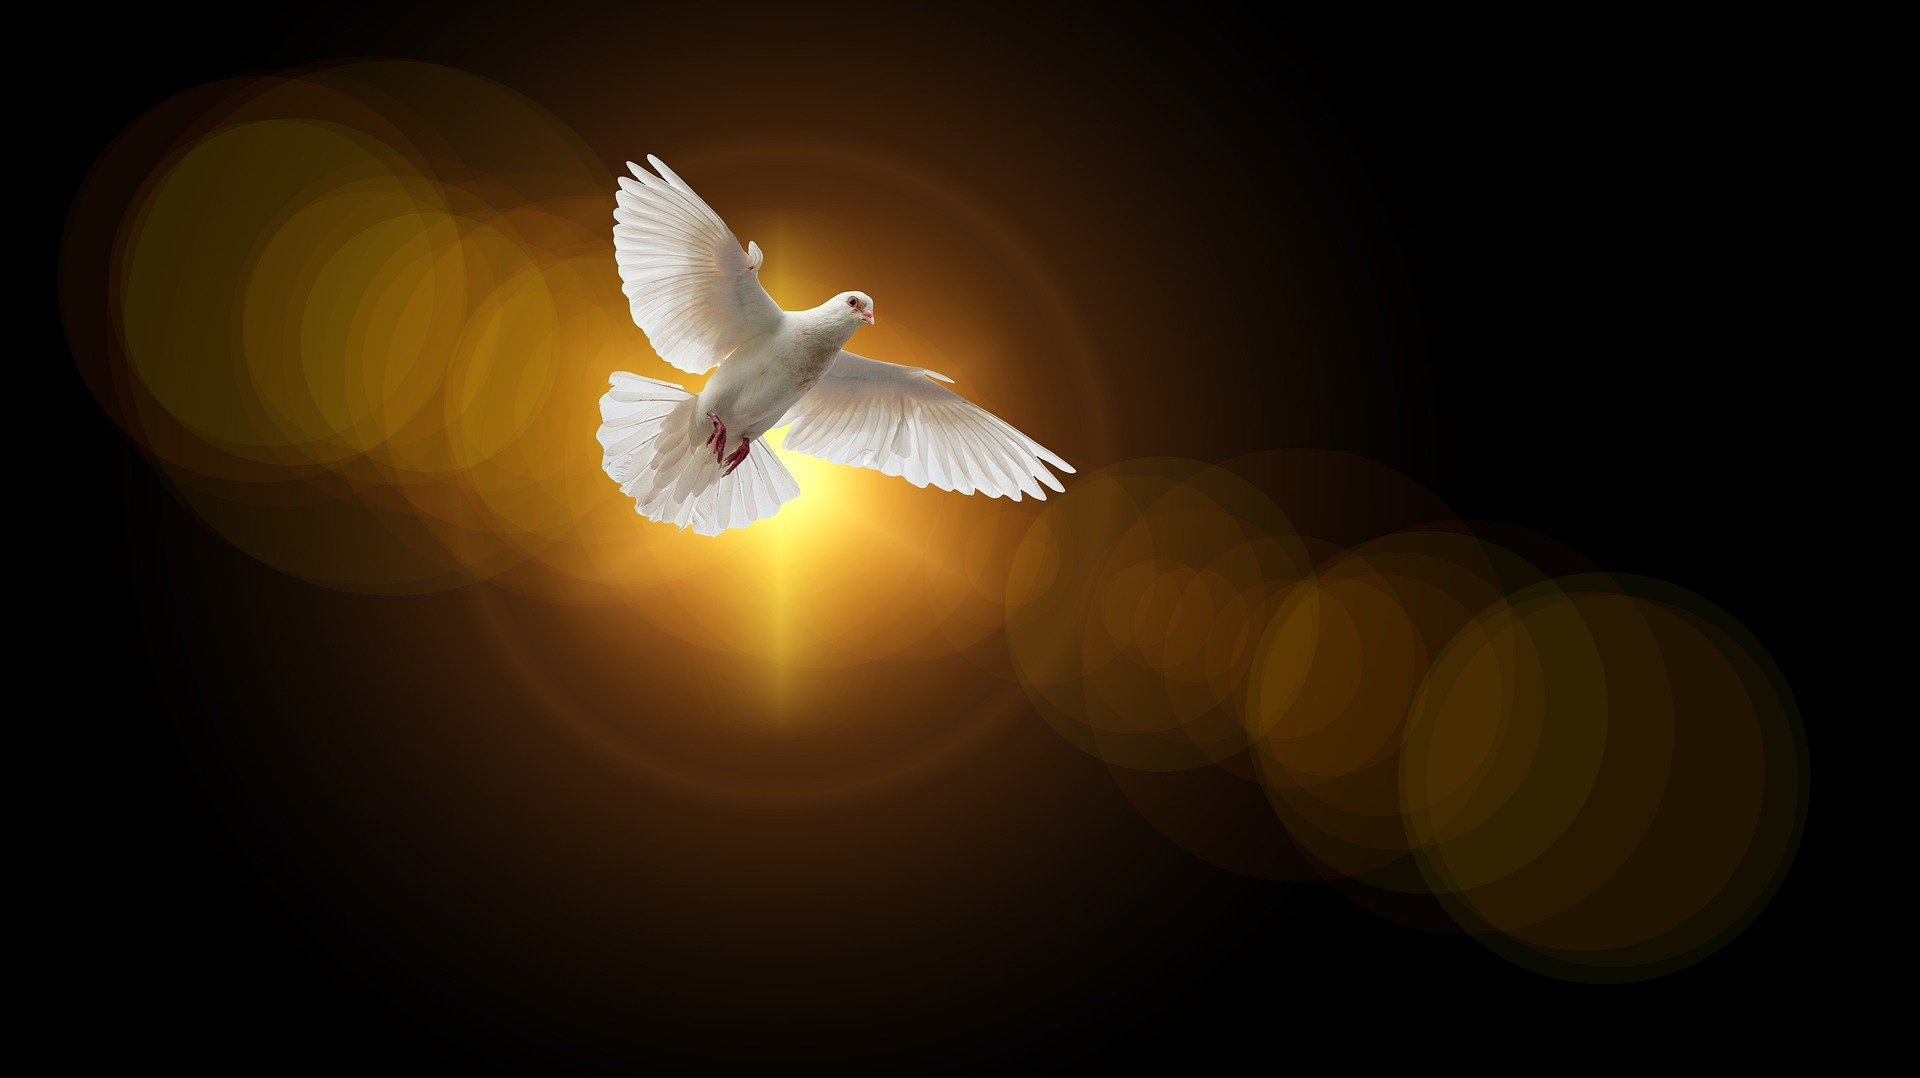 Komm Heiliger Geist - Online Exerzitien